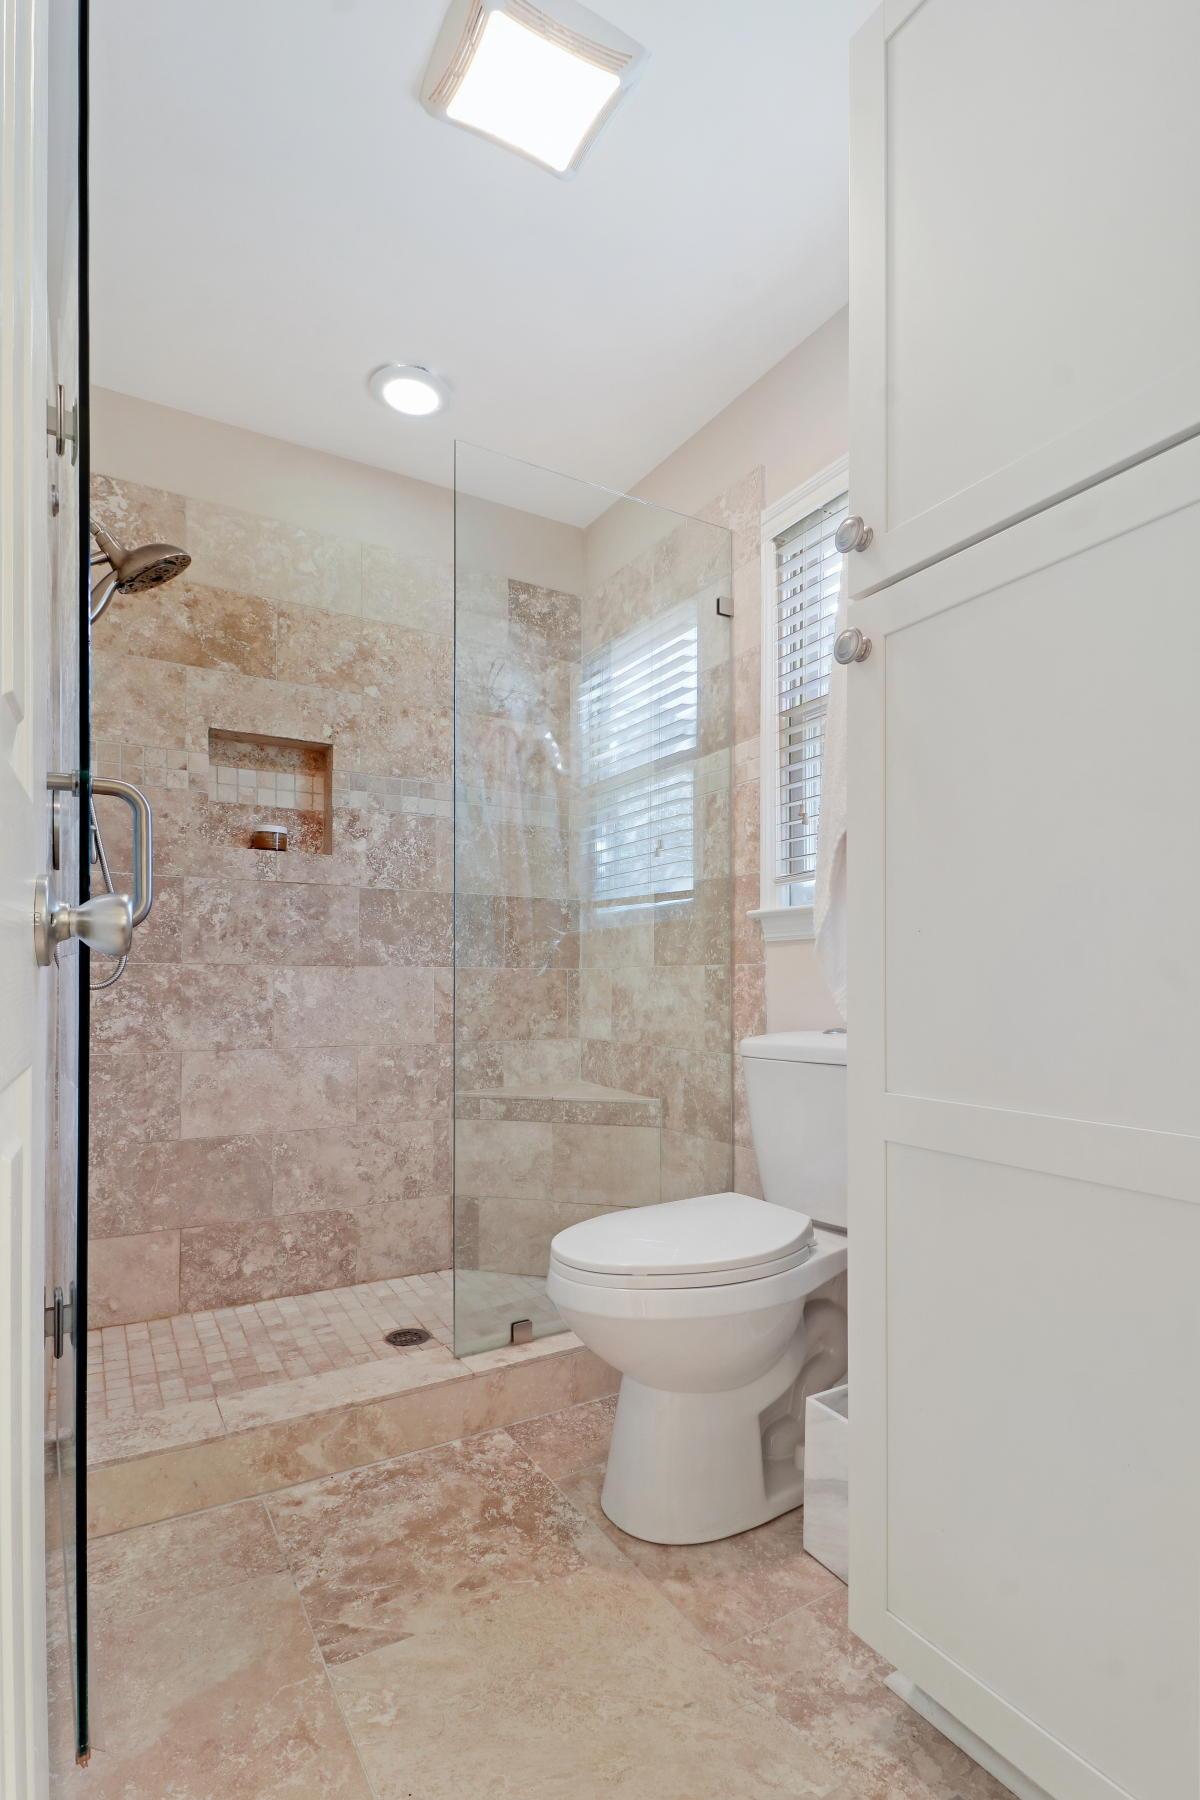 Harrison Acres Homes For Sale - 51 Markfield, Charleston, SC - 15